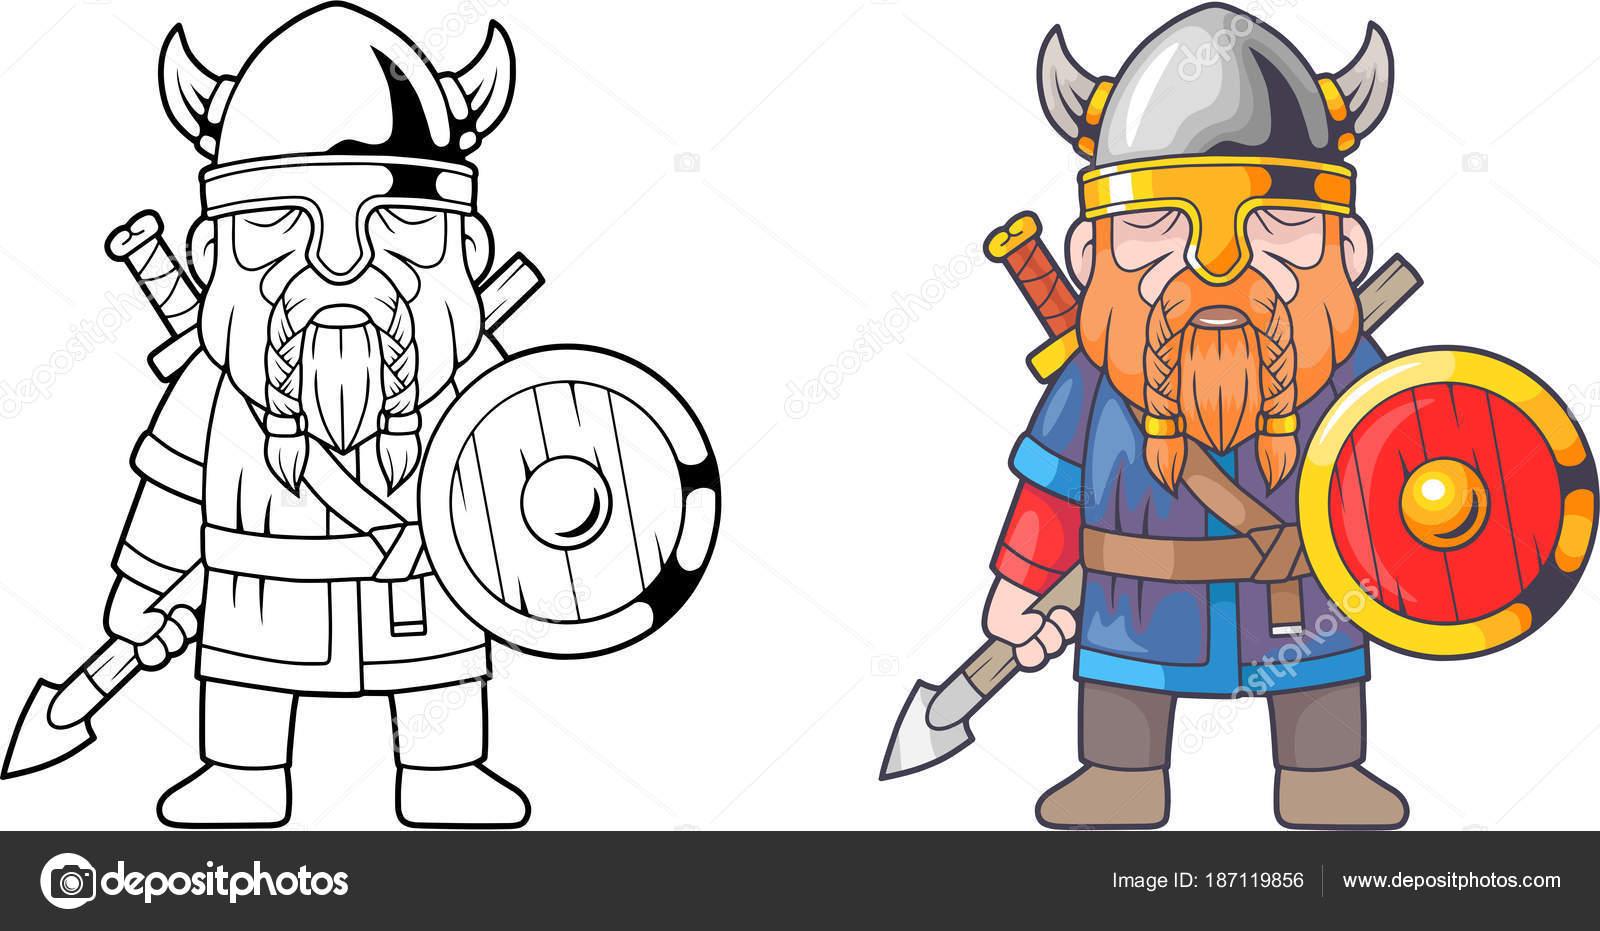 Funny Viking Coloring Book Stock Vector C Fargon 187119856